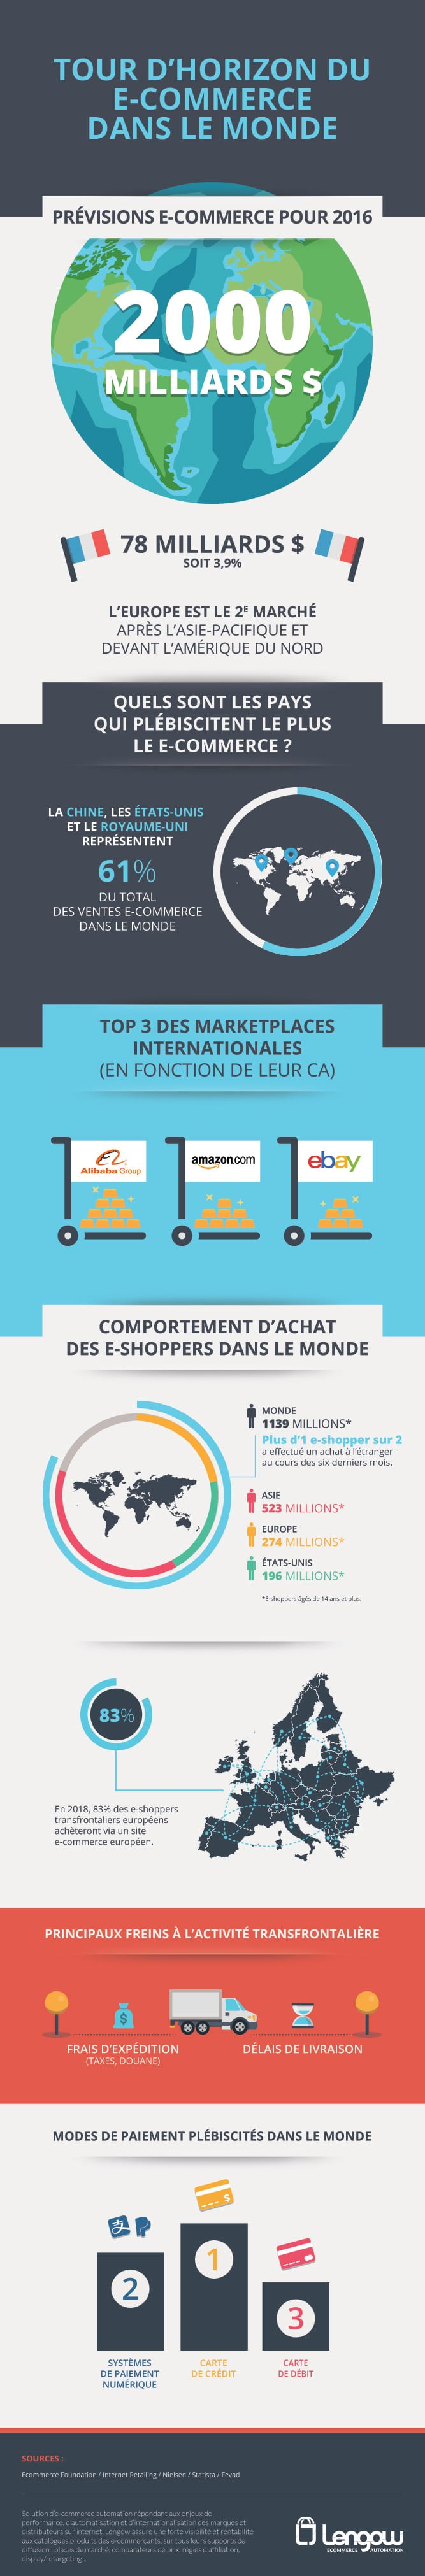 infographie_ecommerce_monde_2016